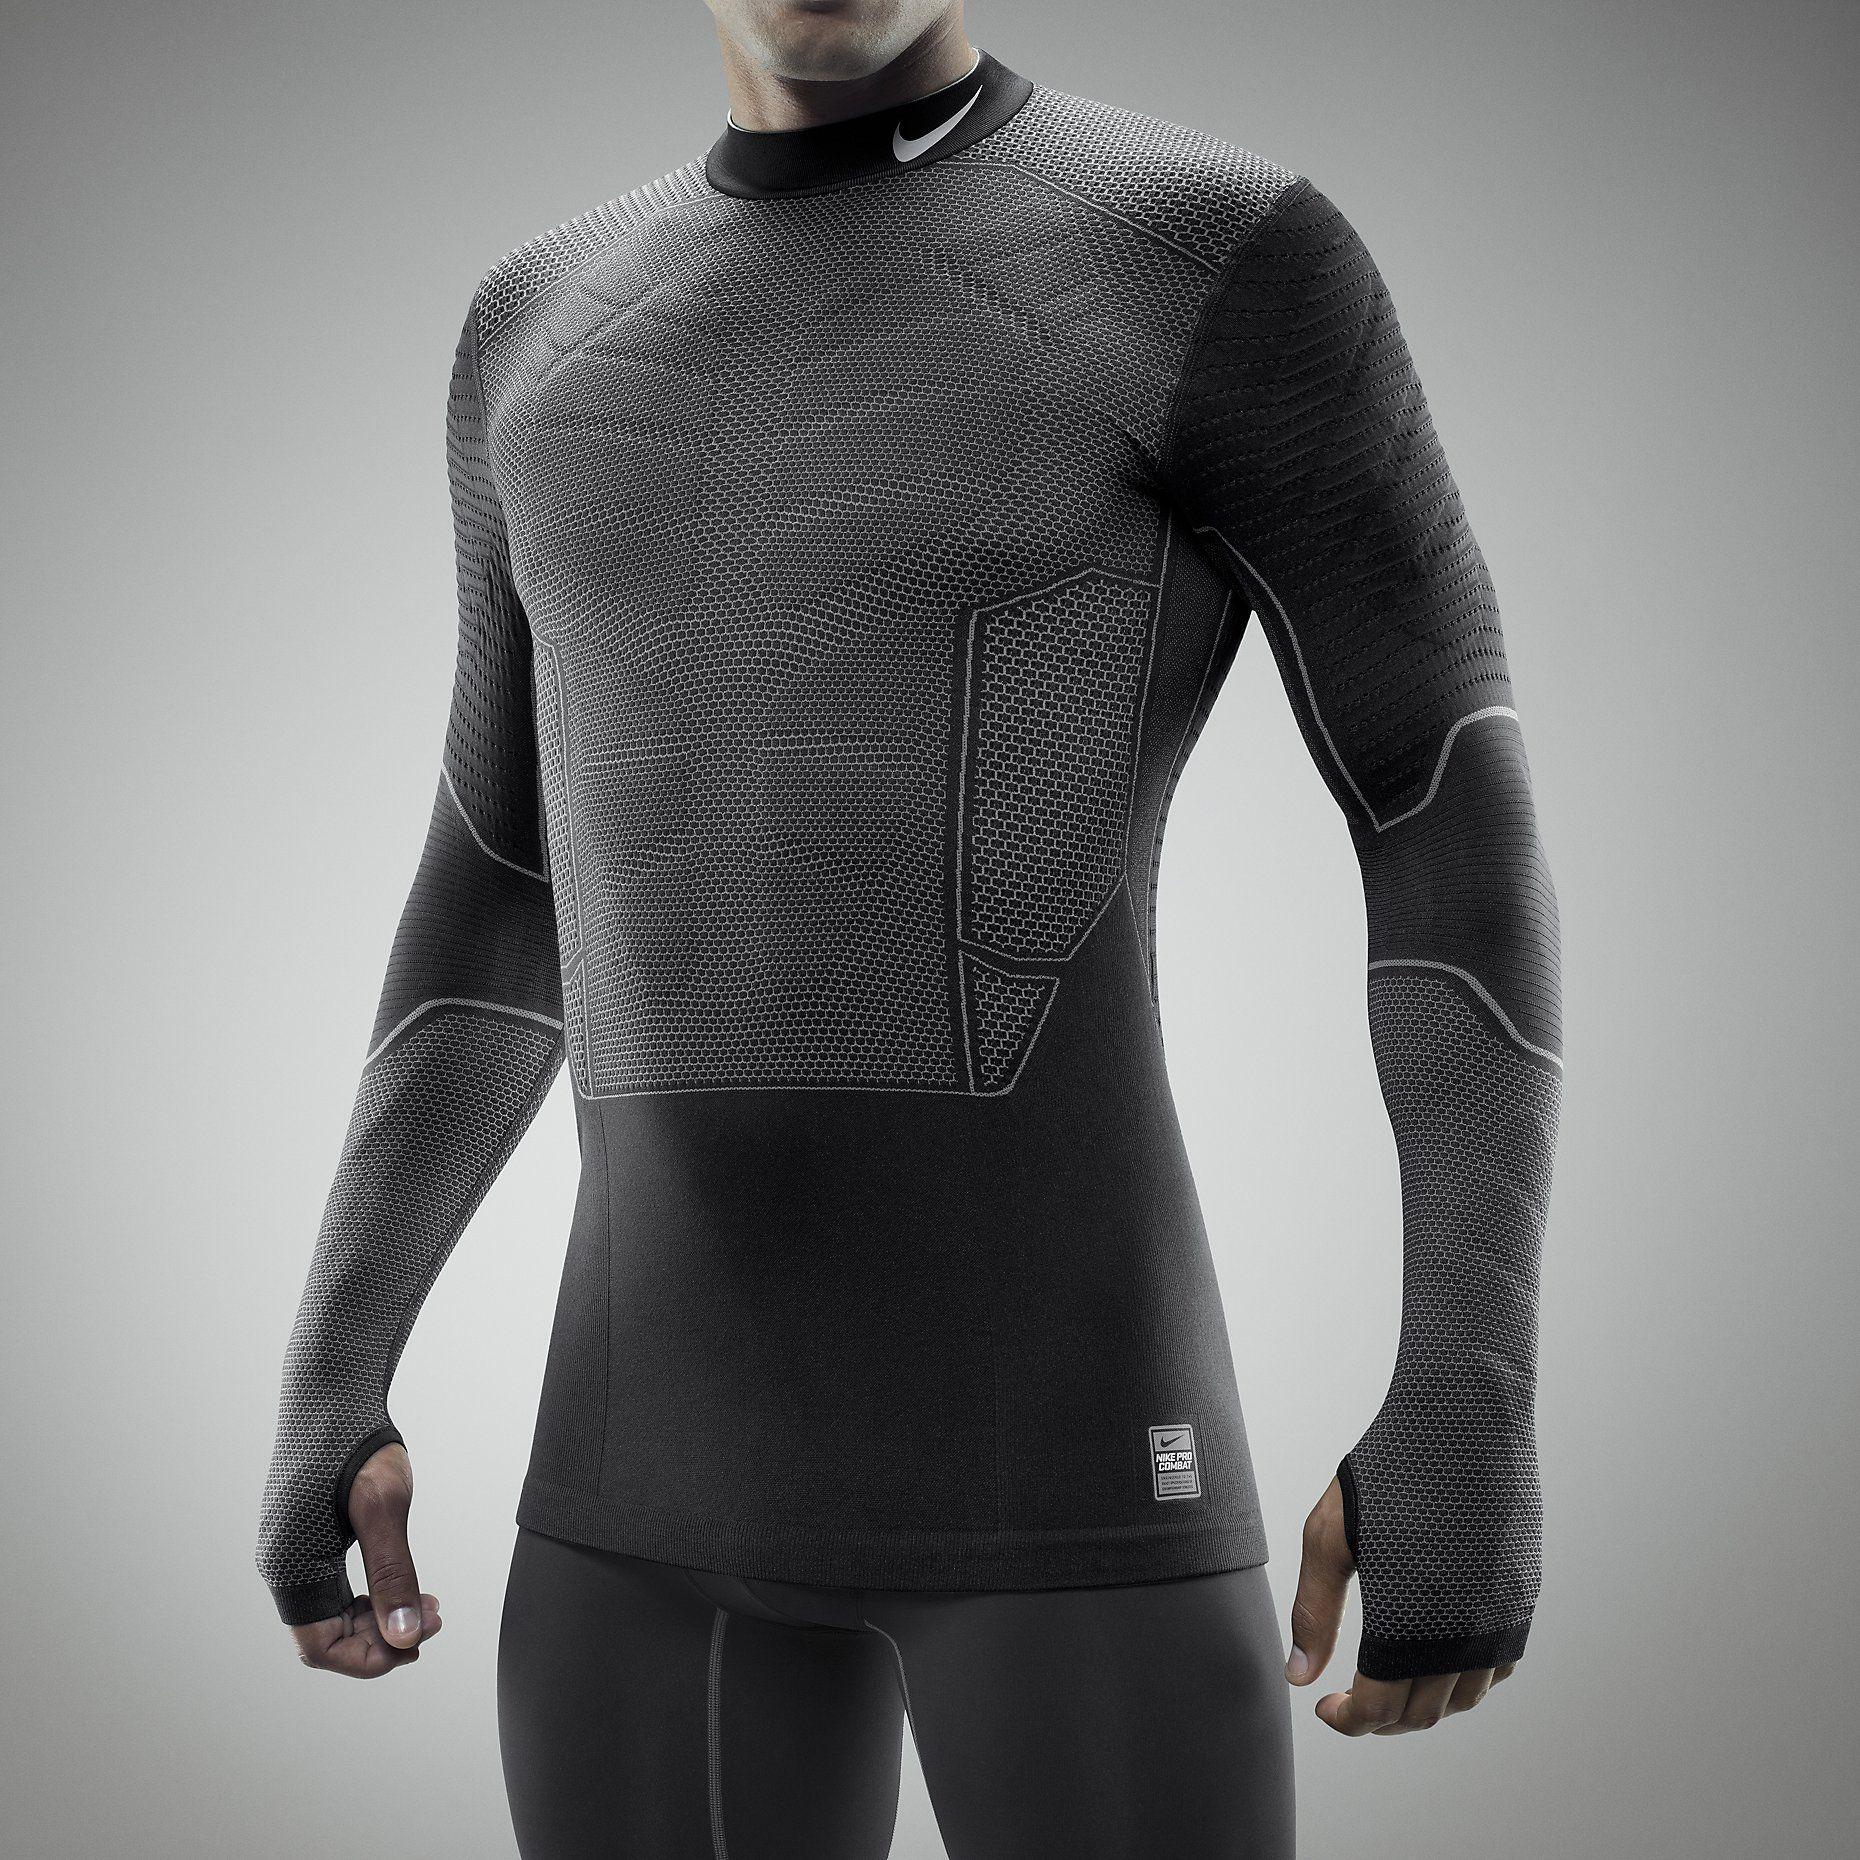 a0fcdf4a11ce1 Nike Pro Combat Hyperwarm Flex Mens Shirt. Nike Store